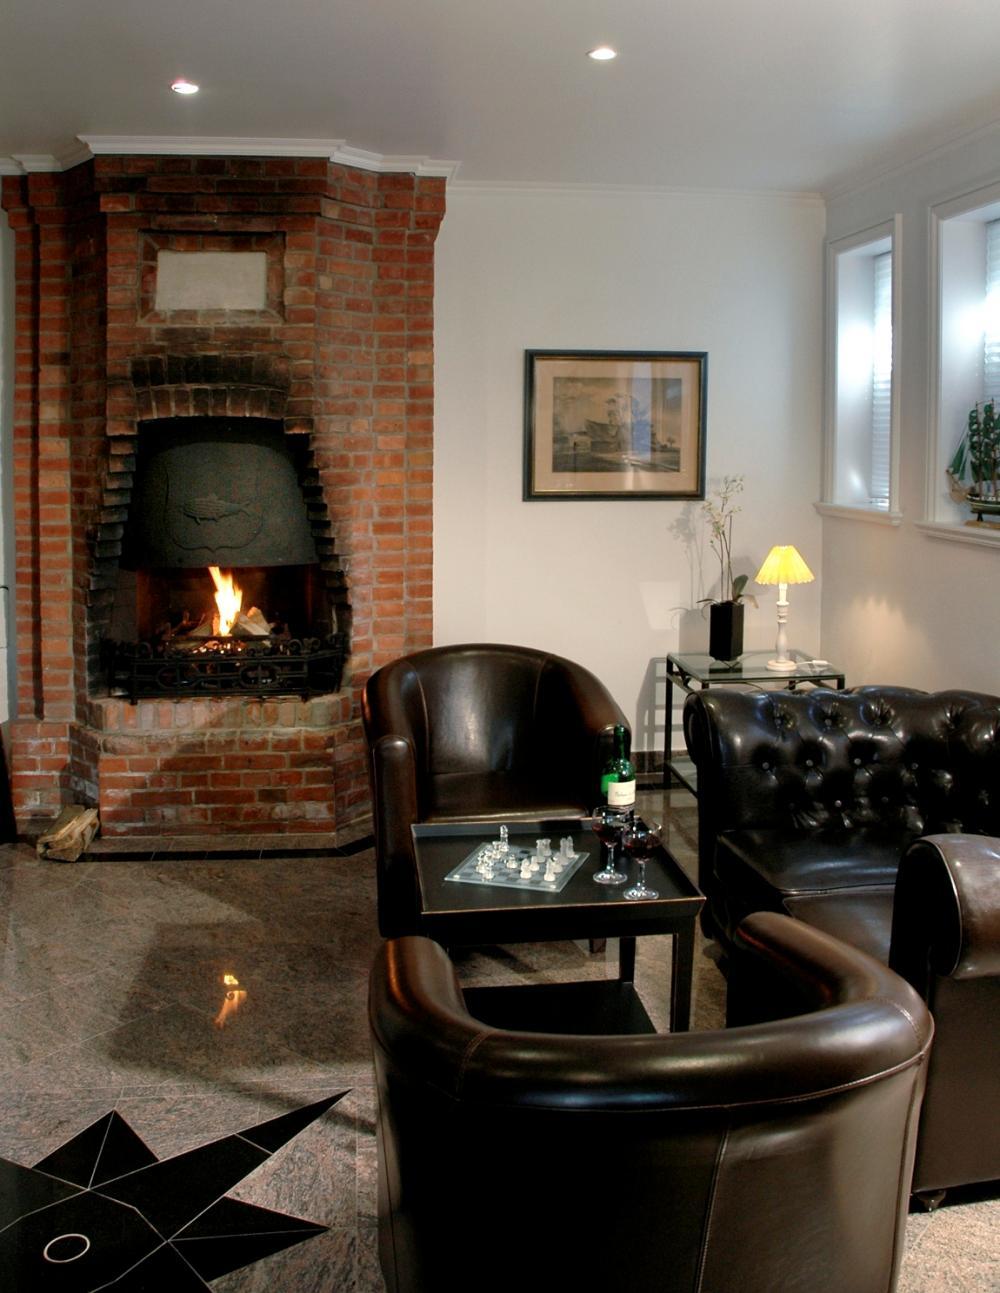 koloniales feuerspiel kolonial wohnzimmer in braun. Black Bedroom Furniture Sets. Home Design Ideas